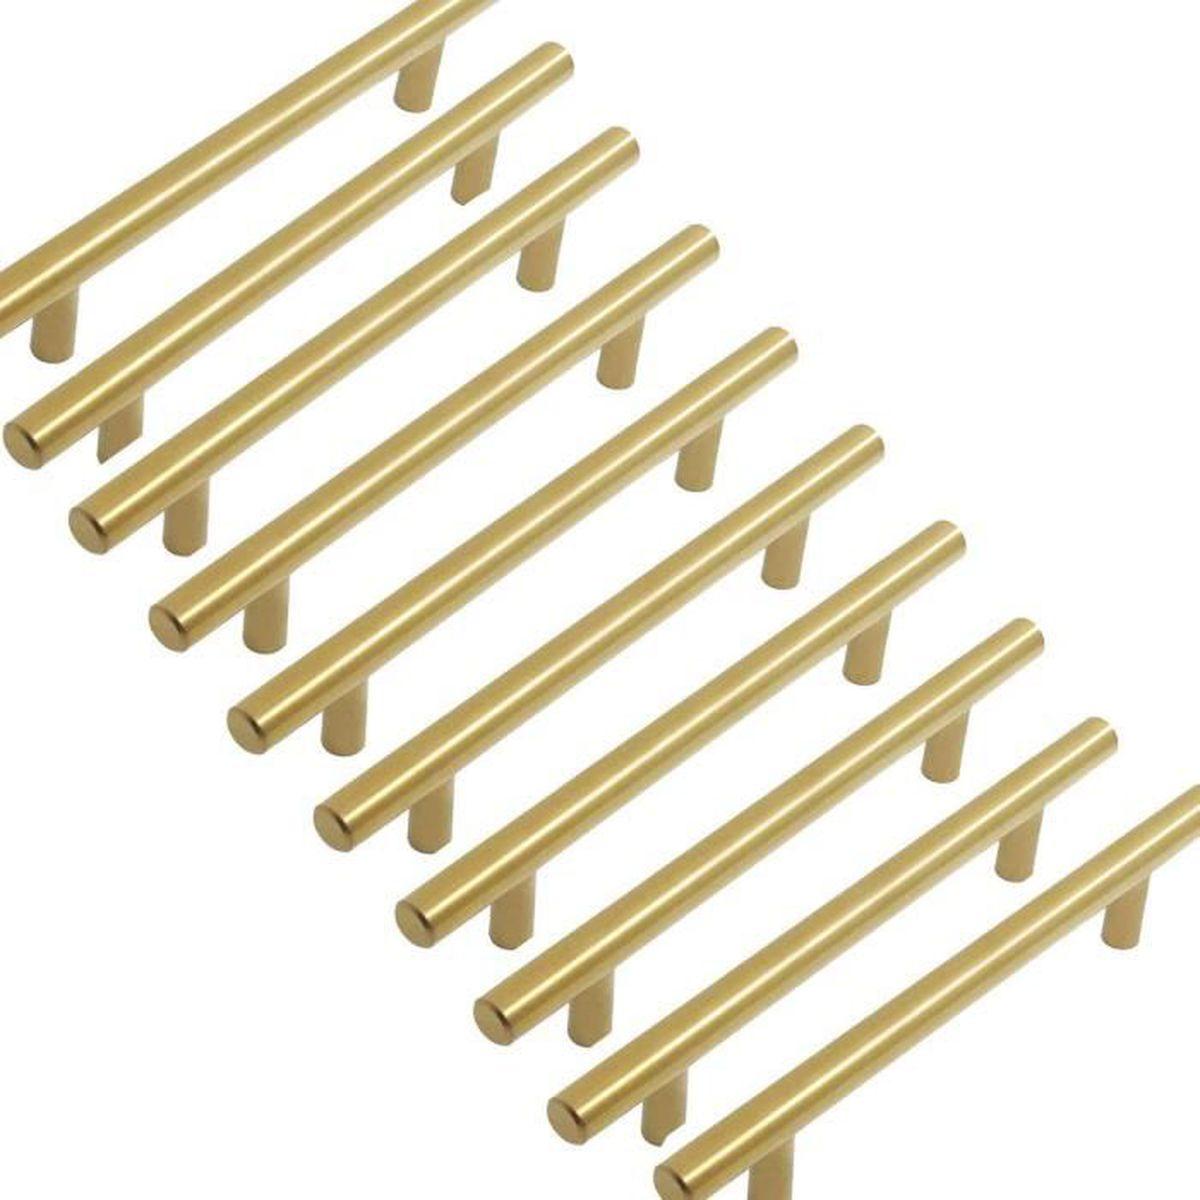 Poignee Porte Placard Cuisine poignee de meuble laiton - probrico barre de porte boutons